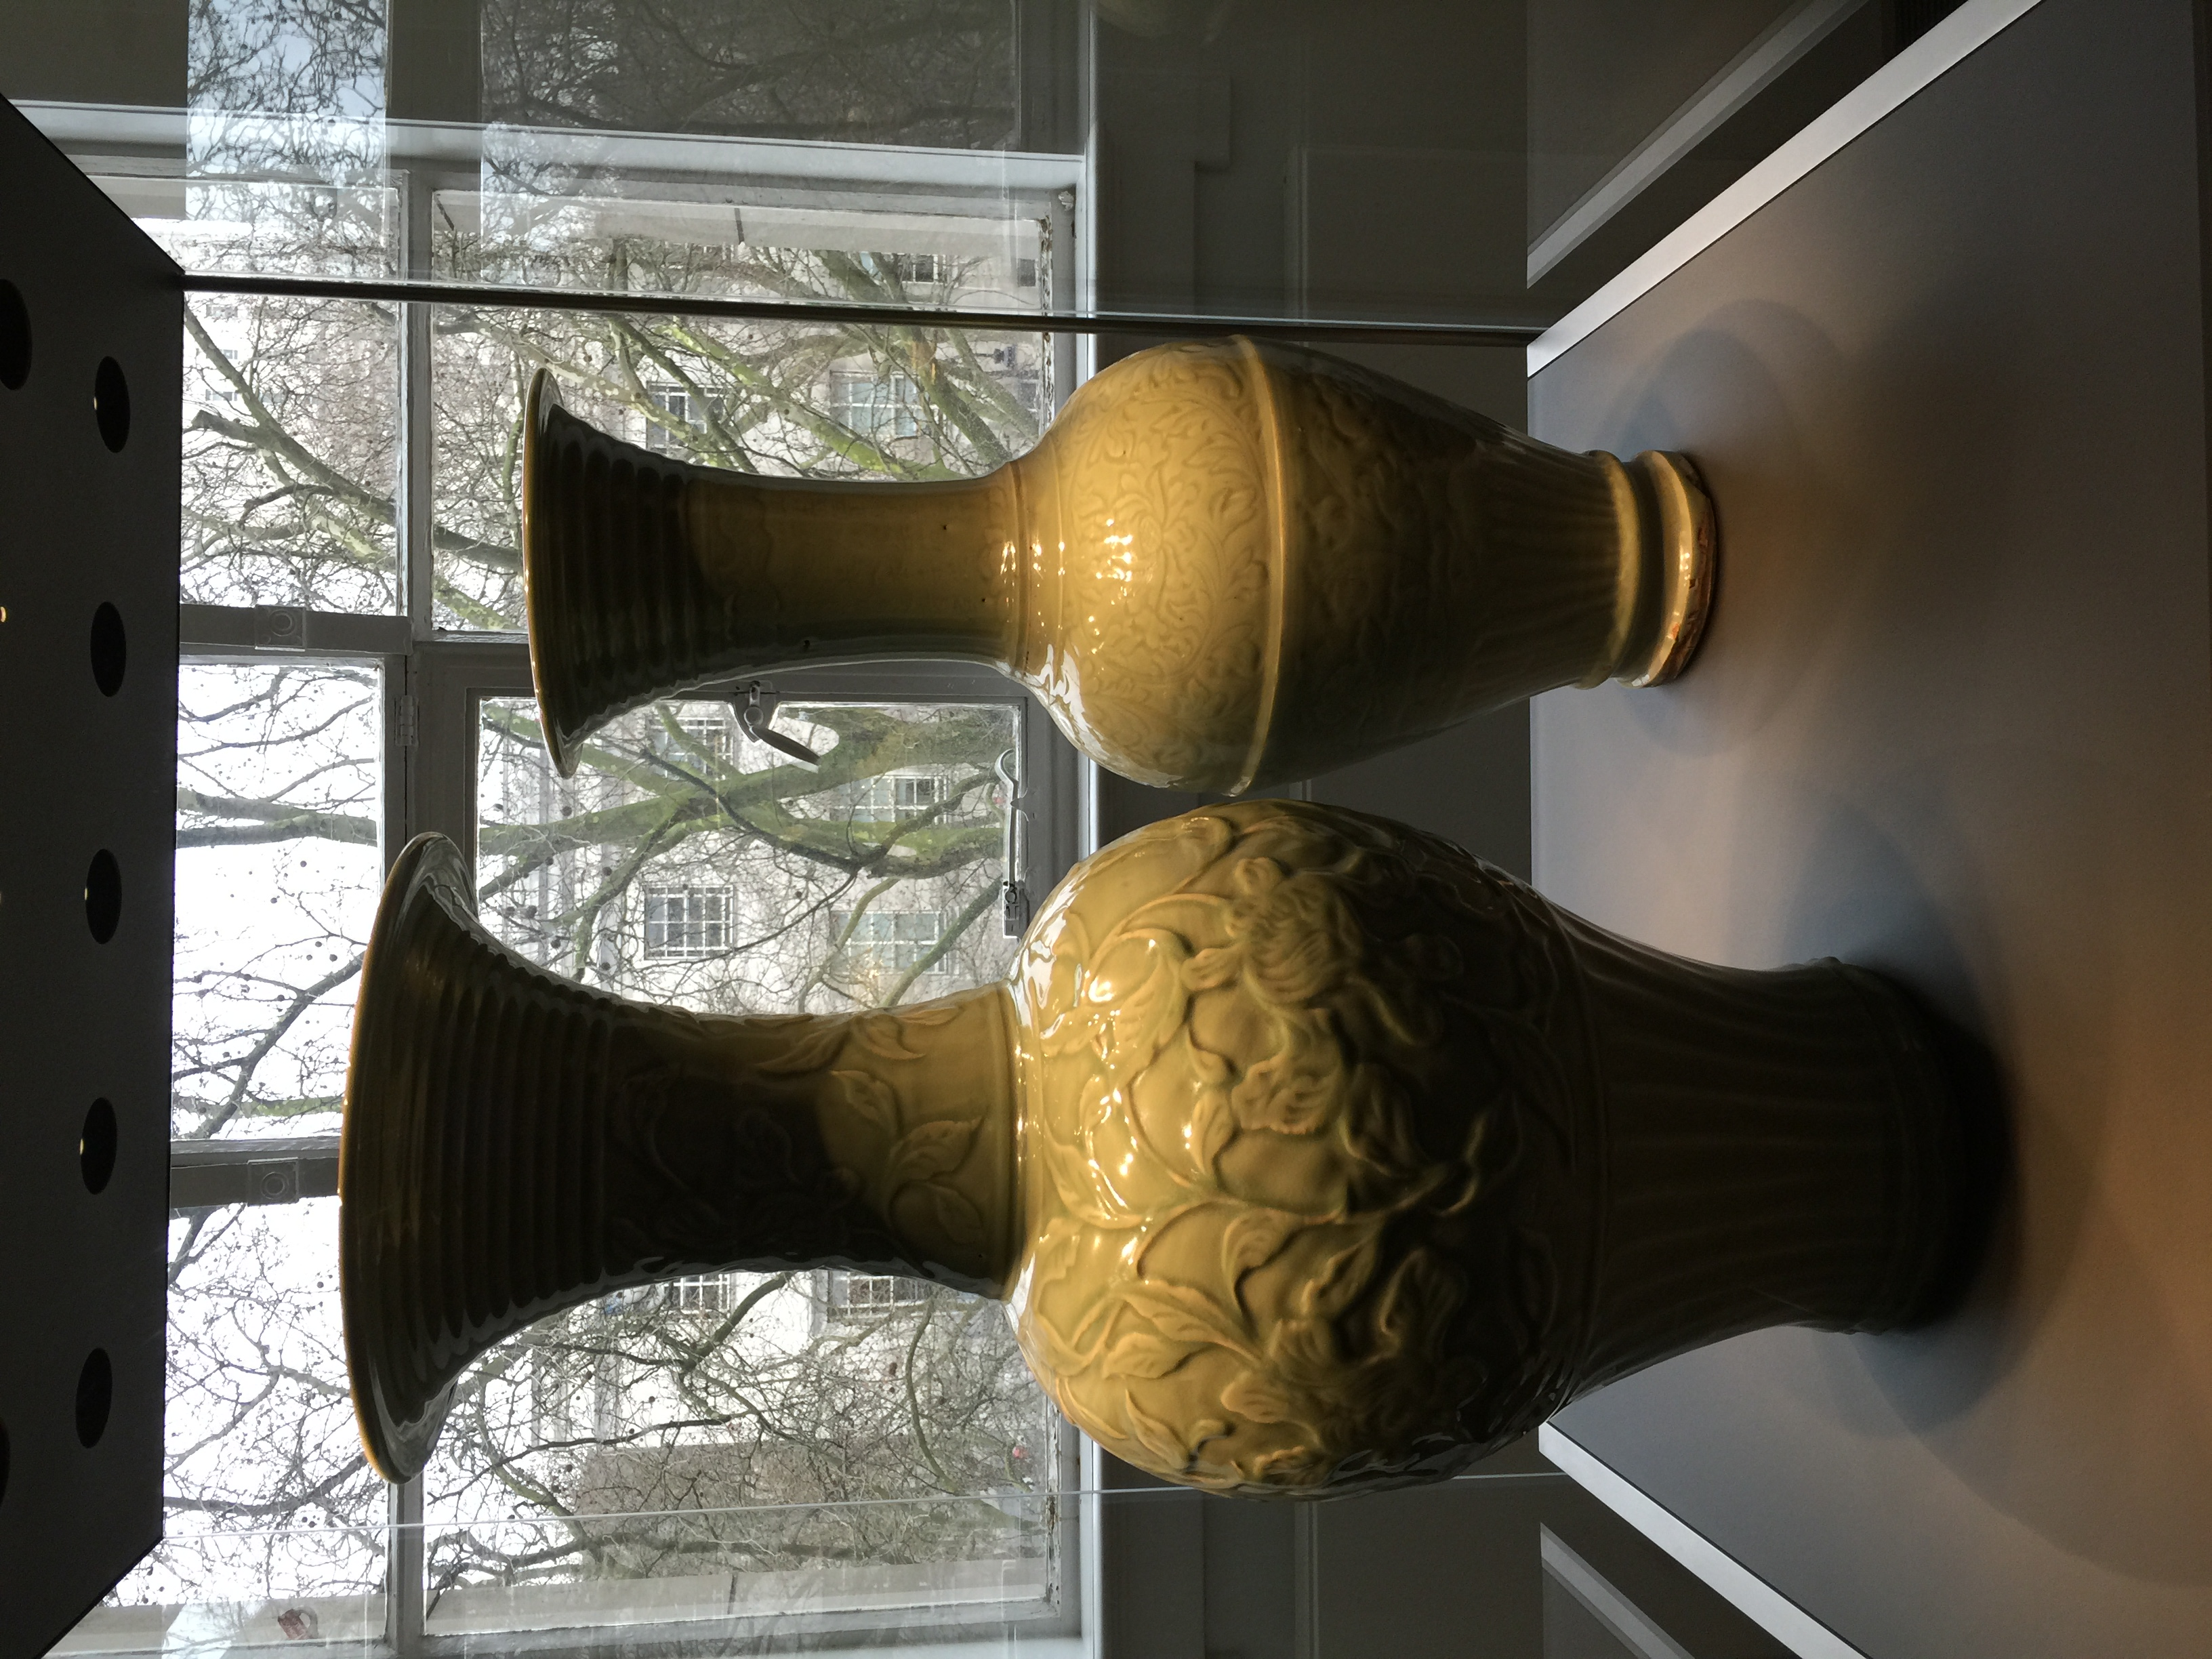 Chinese-Porcelain-British-Museum-Percival-David-jessewaugh.com-11.jpg